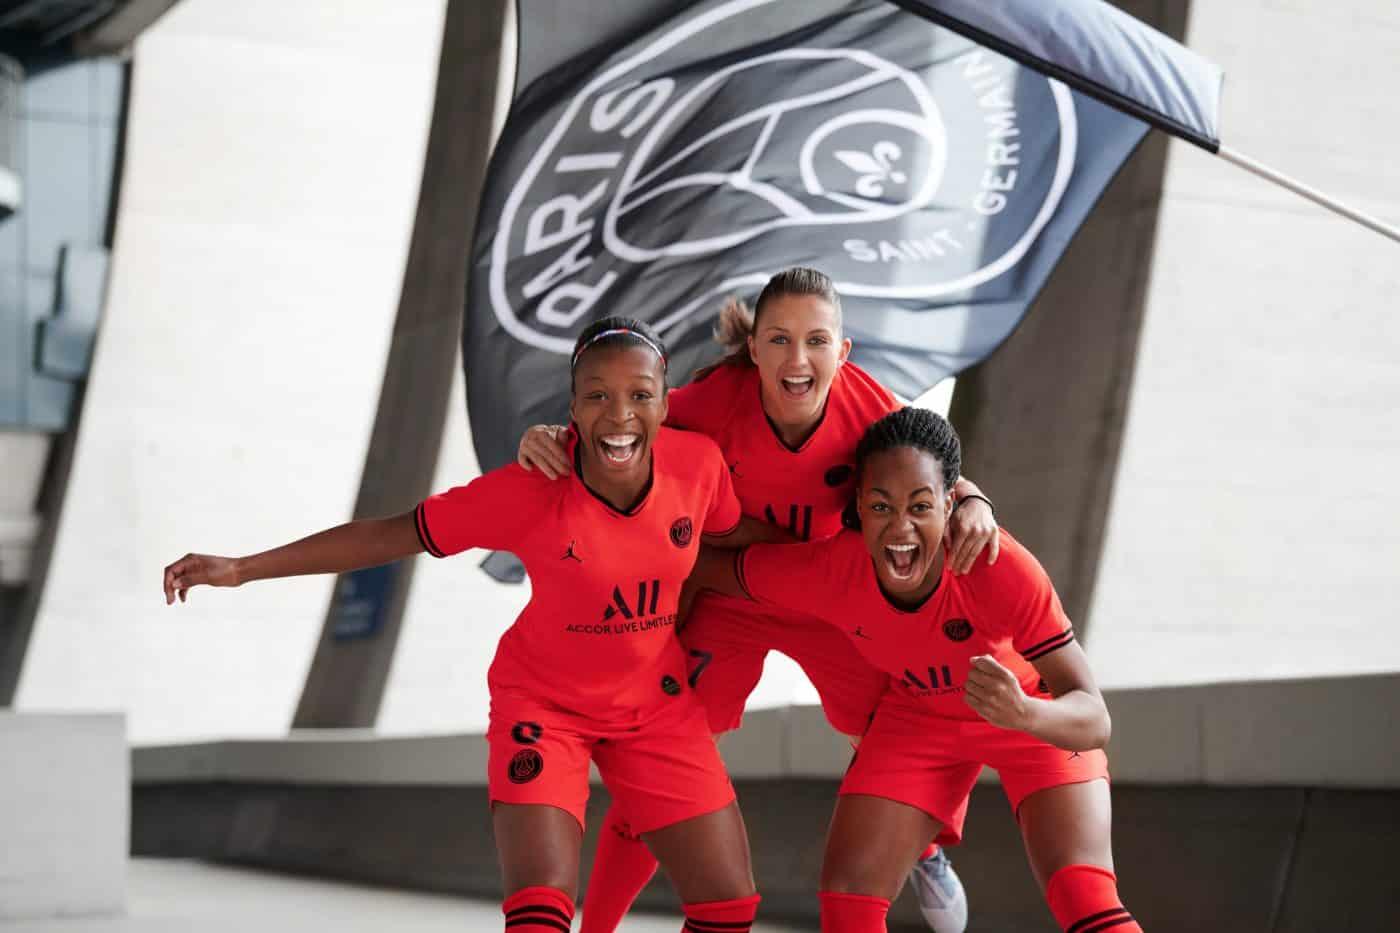 maillot-exterieur-paris-saint-germain-psg-2019-2020-jordan-6